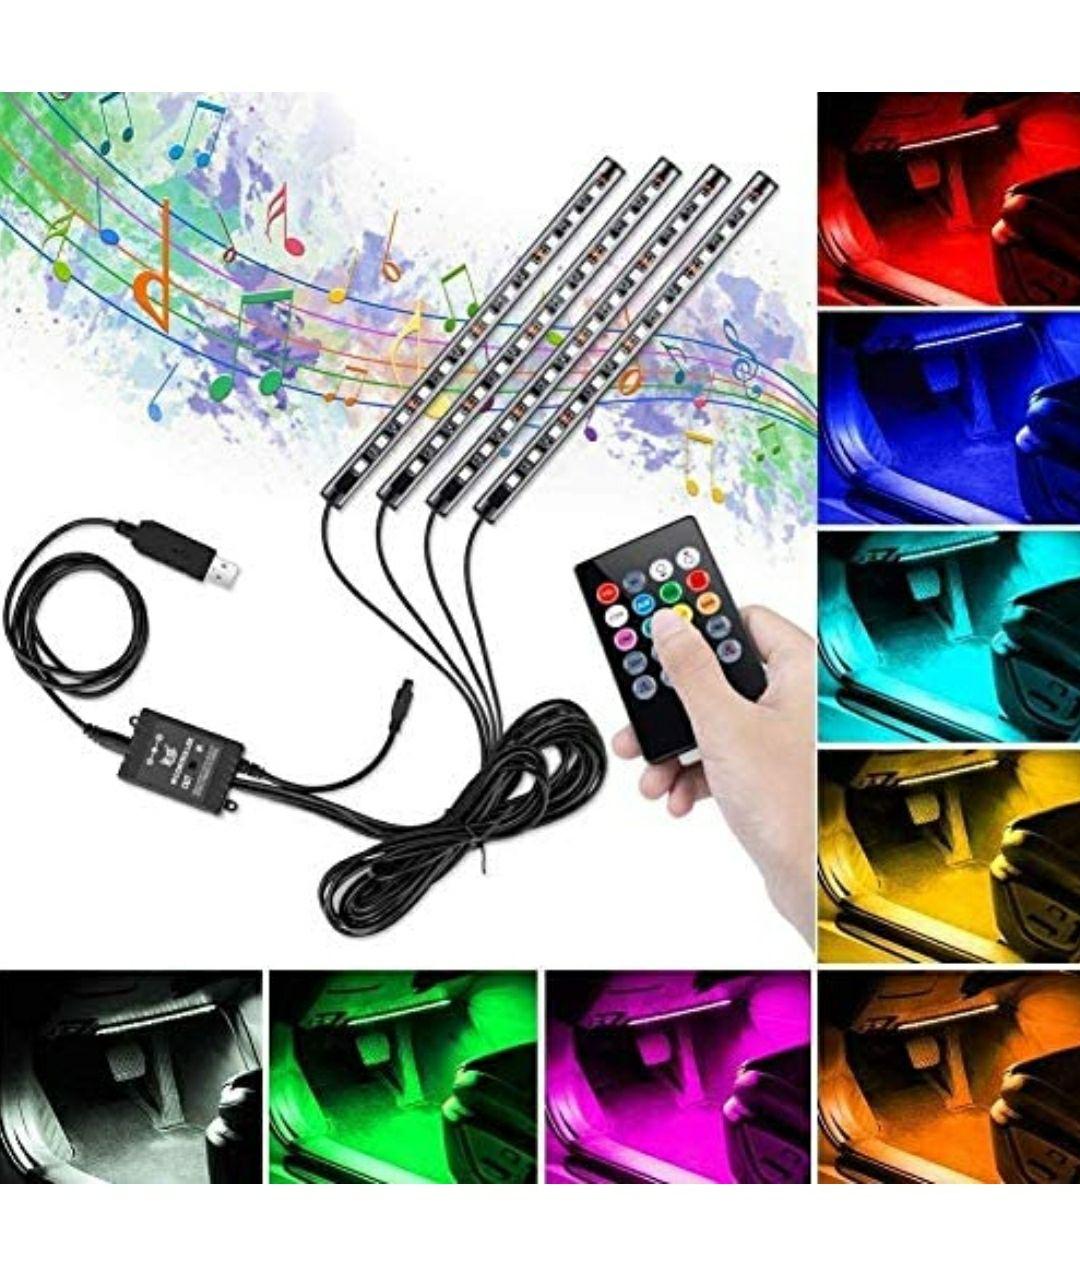 Striscia Led Auto, Winzwon 48 LED DC 12 V Kit Impermeabile con Telecomando Wireless